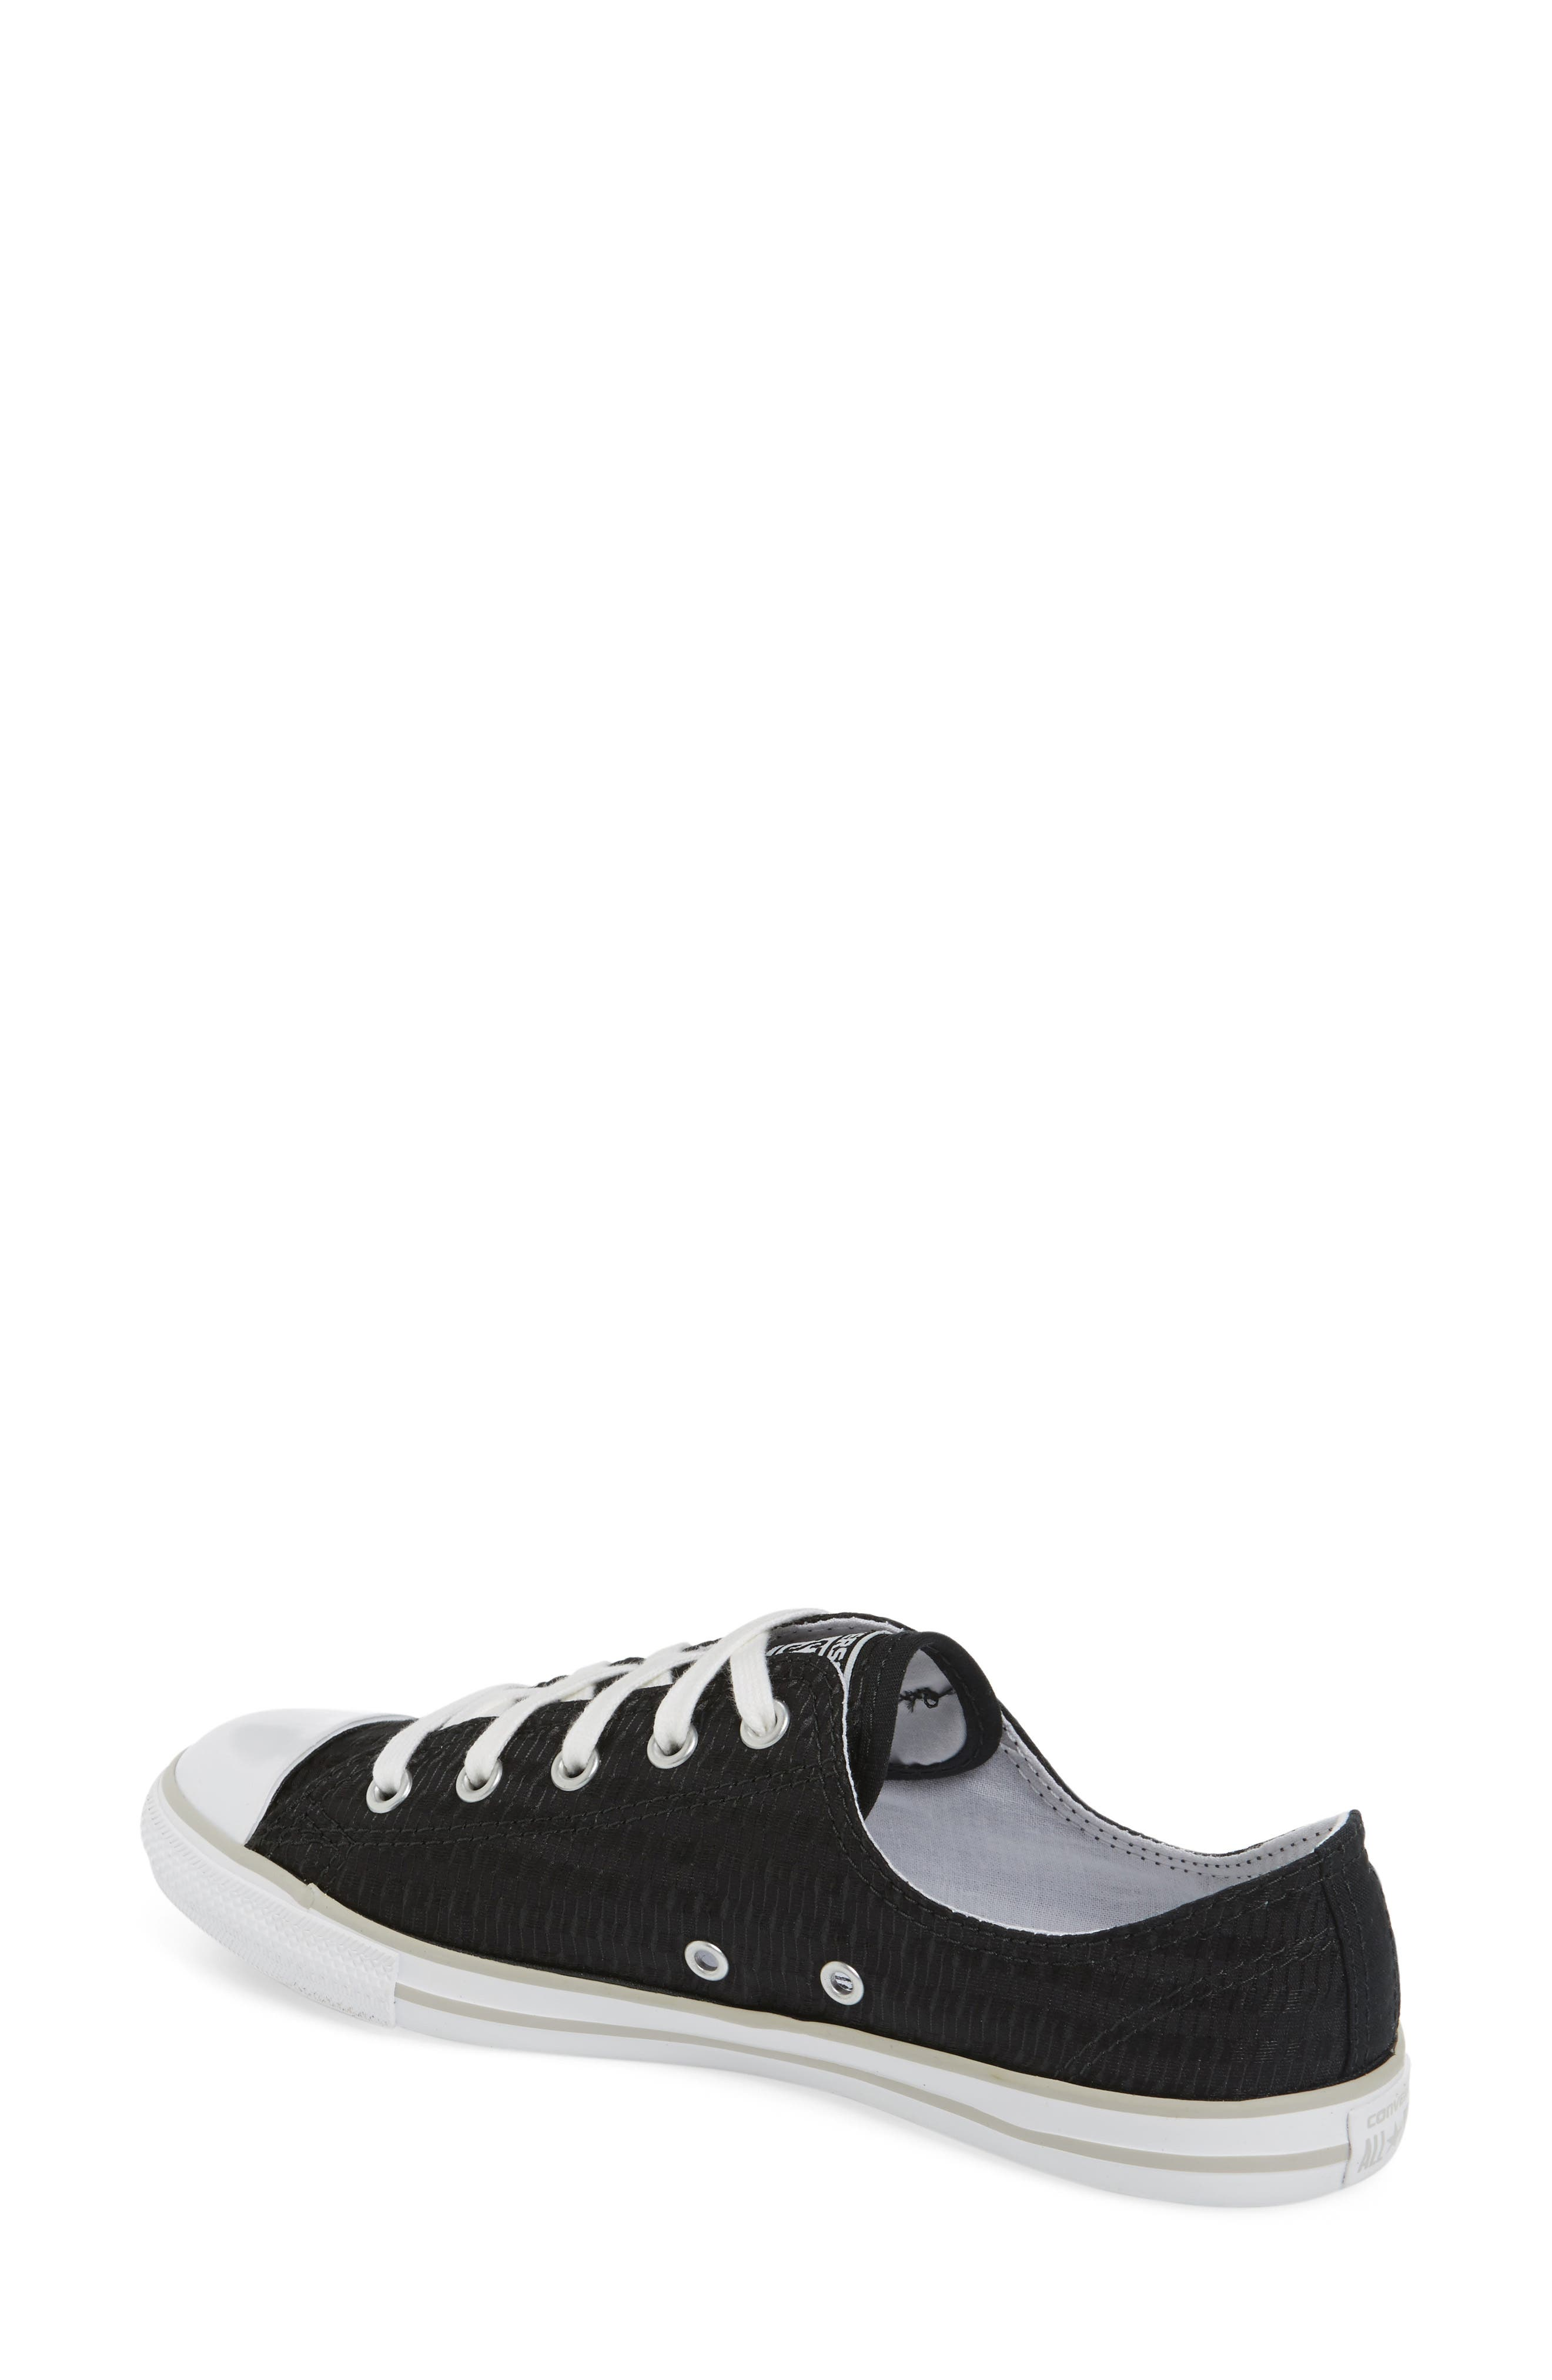 Alternate Image 2  - Chuck Taylor® All Star® Dainty Low Top Sneaker (Women)